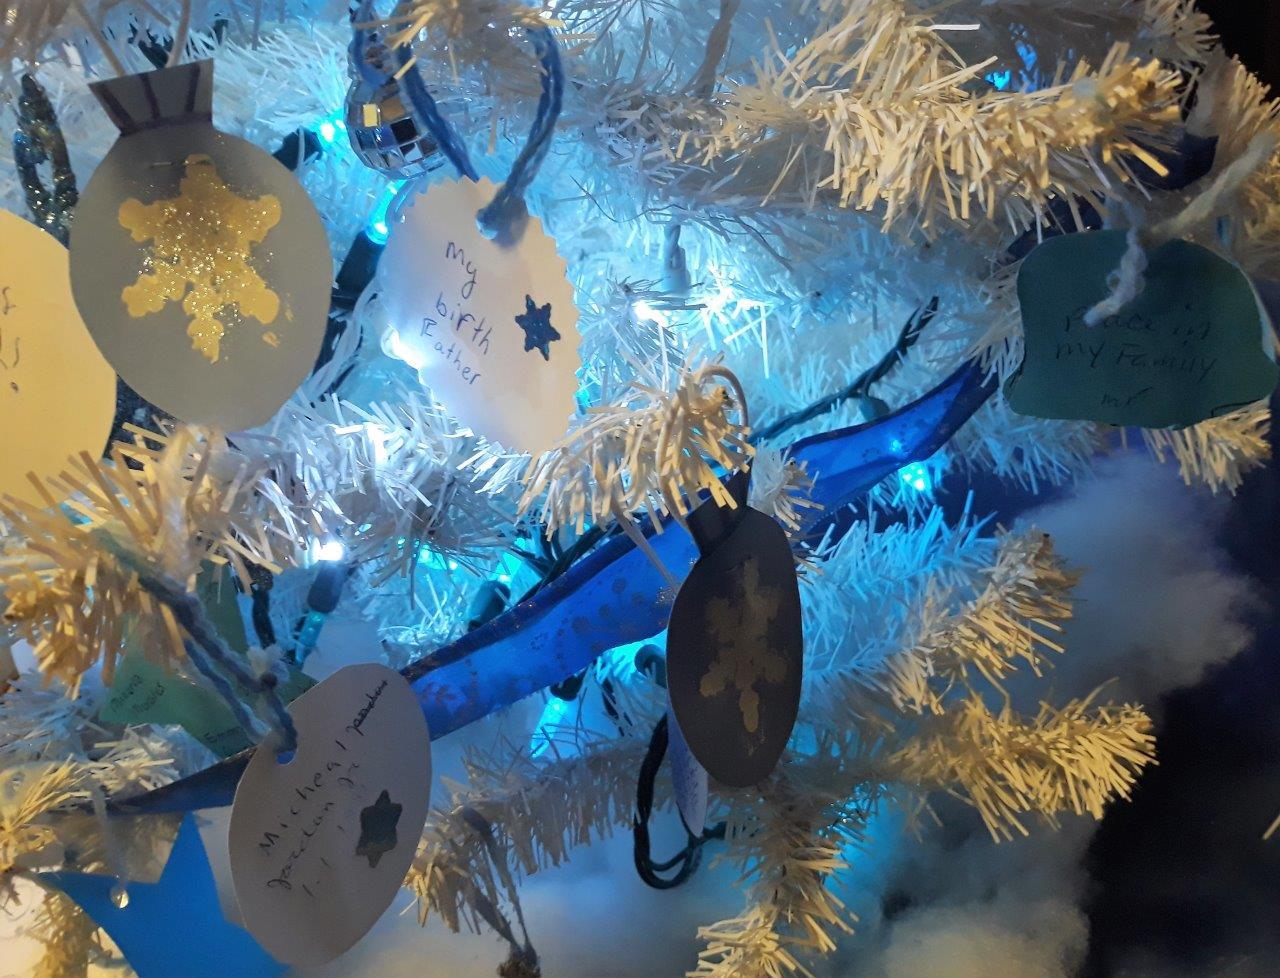 Blue Christmas ornament, 12/31/18